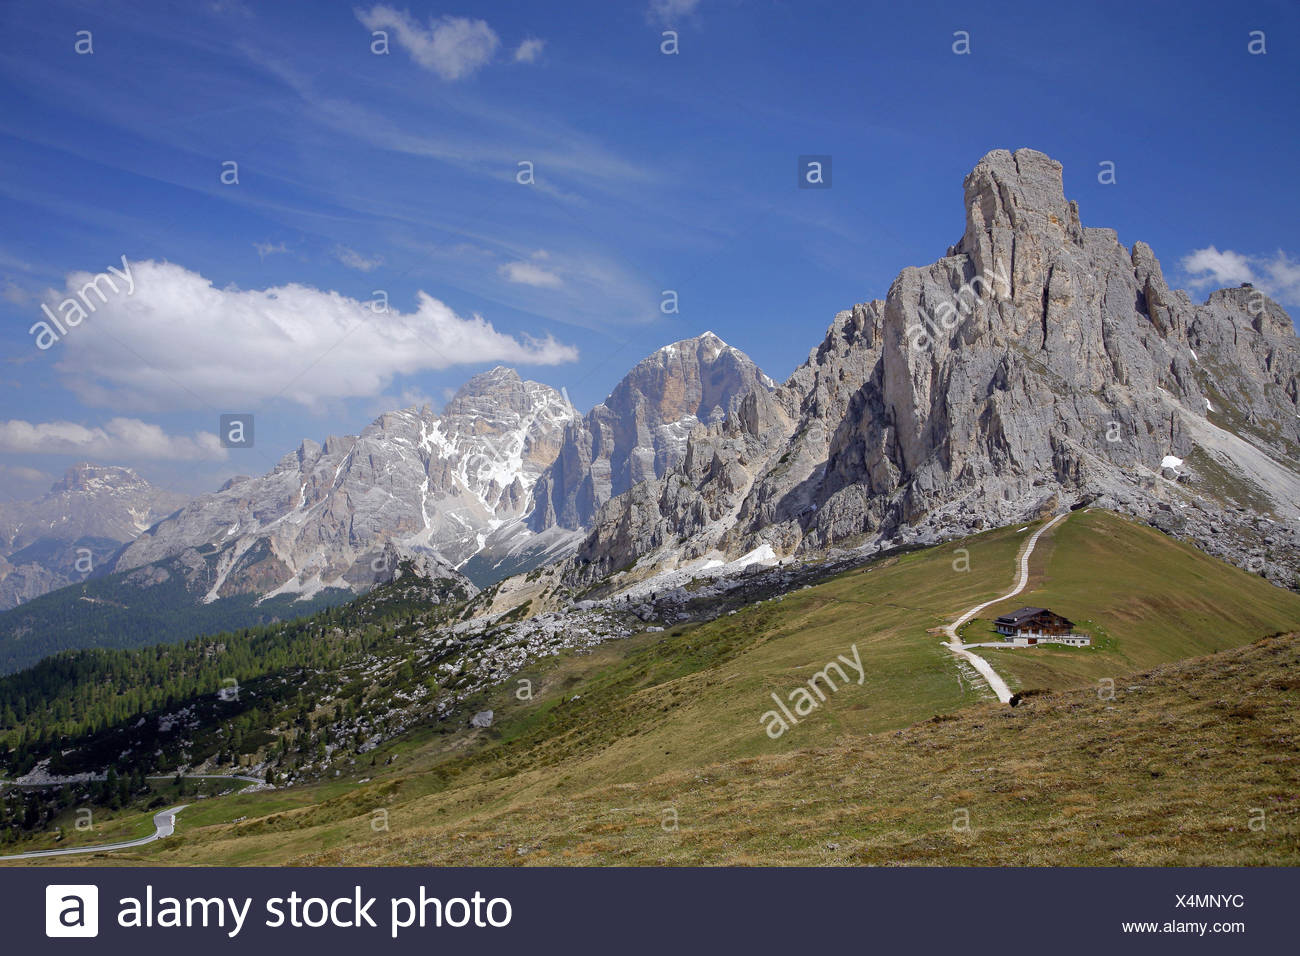 Italy, South Tyrol, the Dolomites, Passo Giau, Ra Gusela, Tofana, - Stock Image